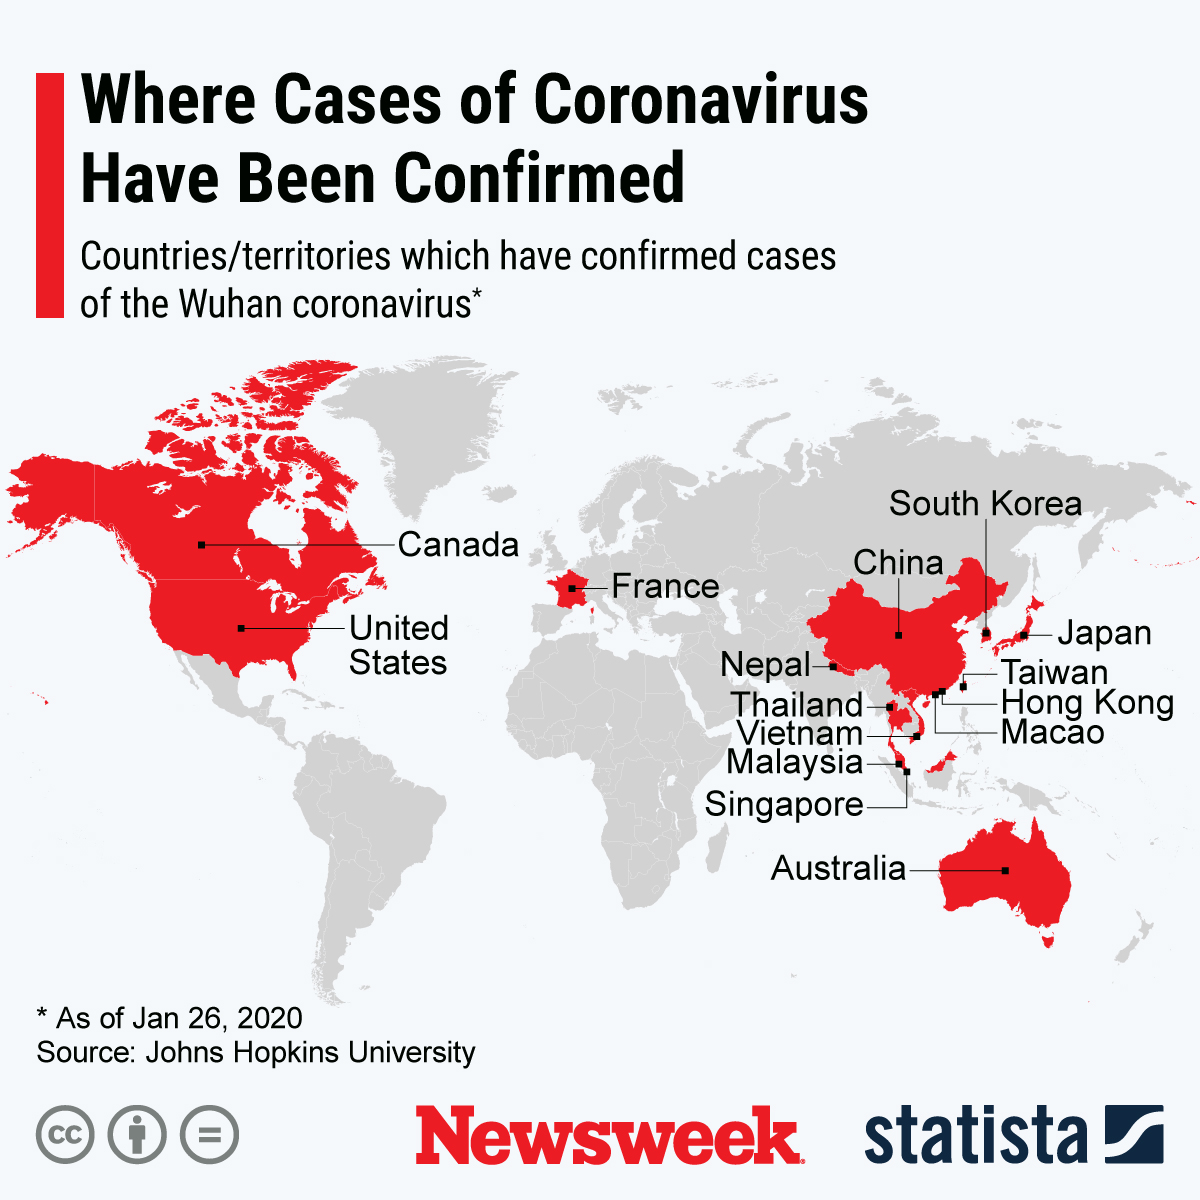 China Sends Military Aid to Help Fight Coronavirus Outbreak